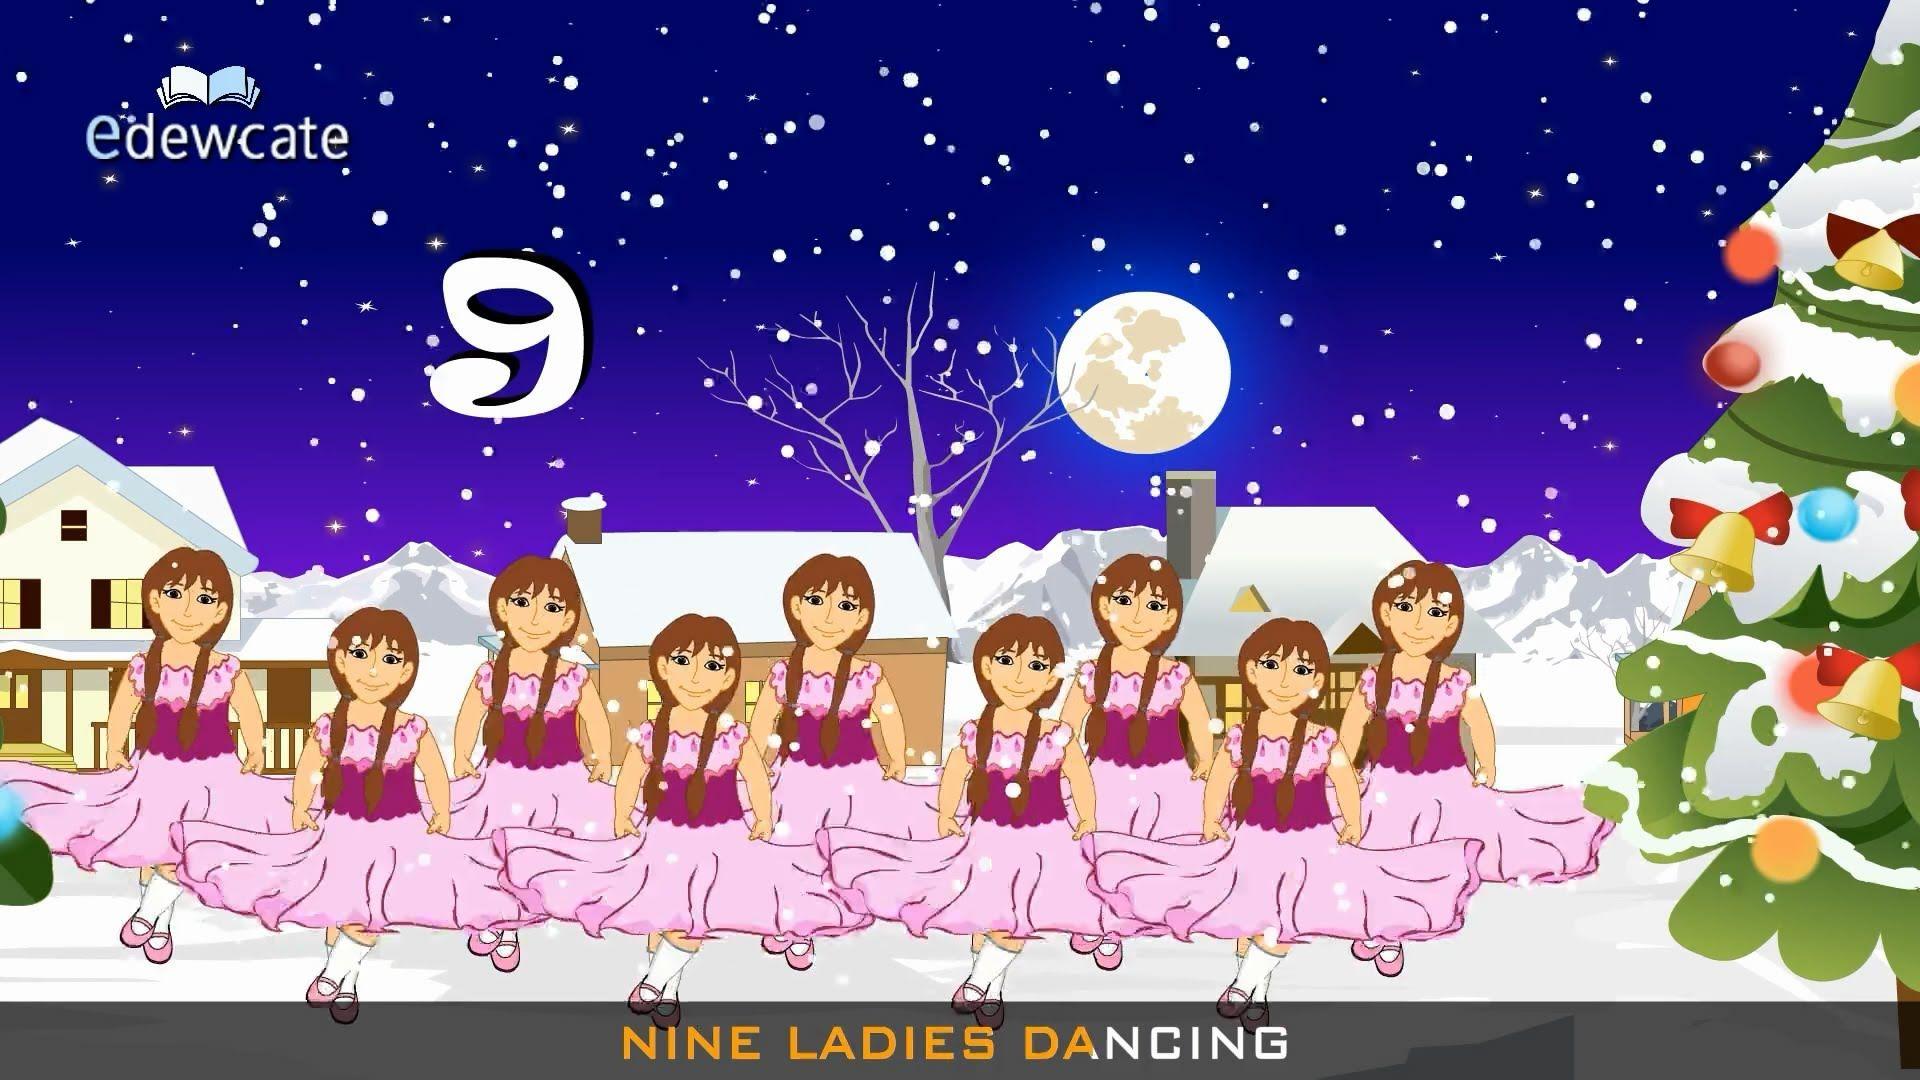 12 Days Of Christmas Songs For Kids Christmas Songs For Kids Days Of Christmas Song Christmas Carols Songs